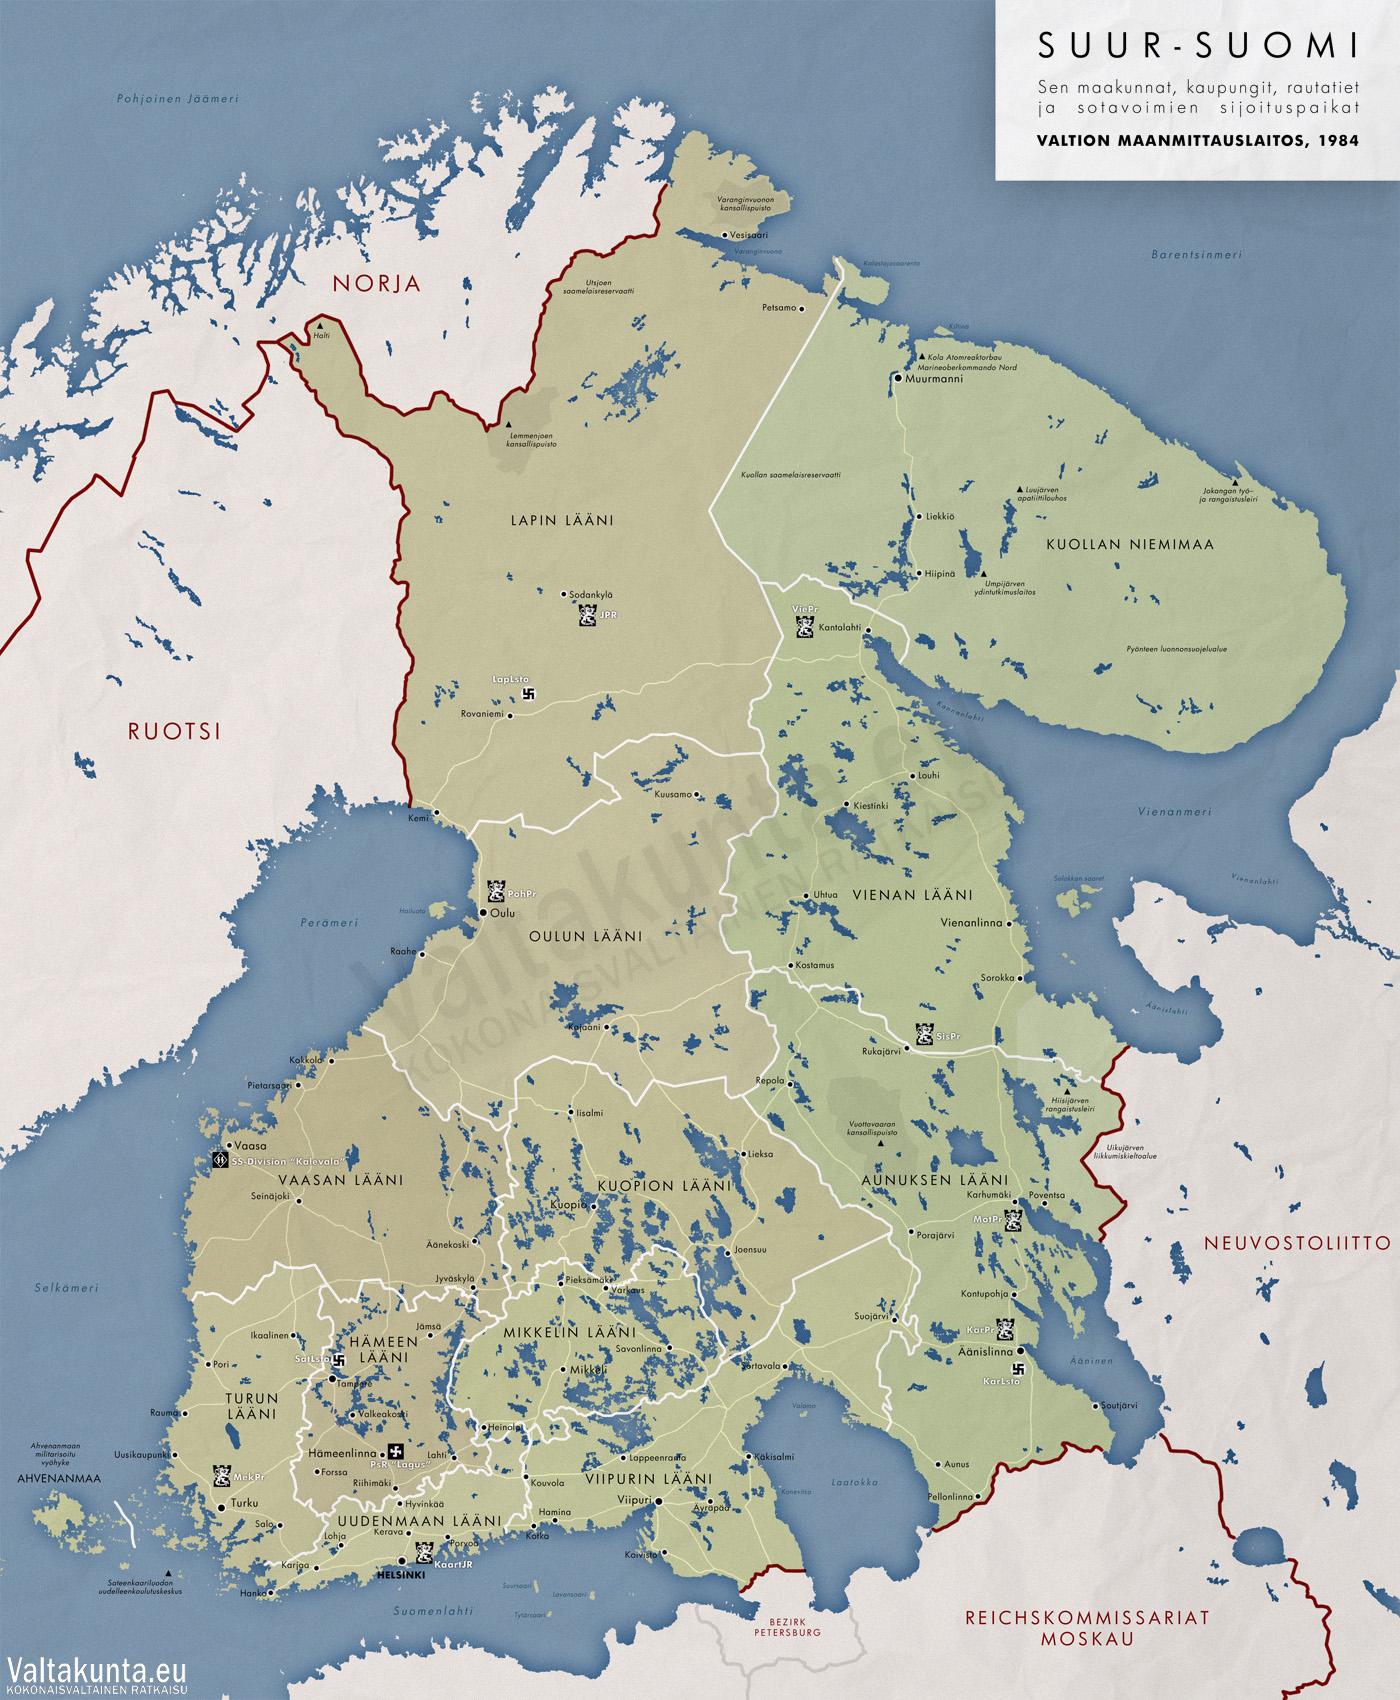 vanha suomen kartta 1939 Tag Suomen Kartta Ennen 1939 — waldon.protese de silicone.info